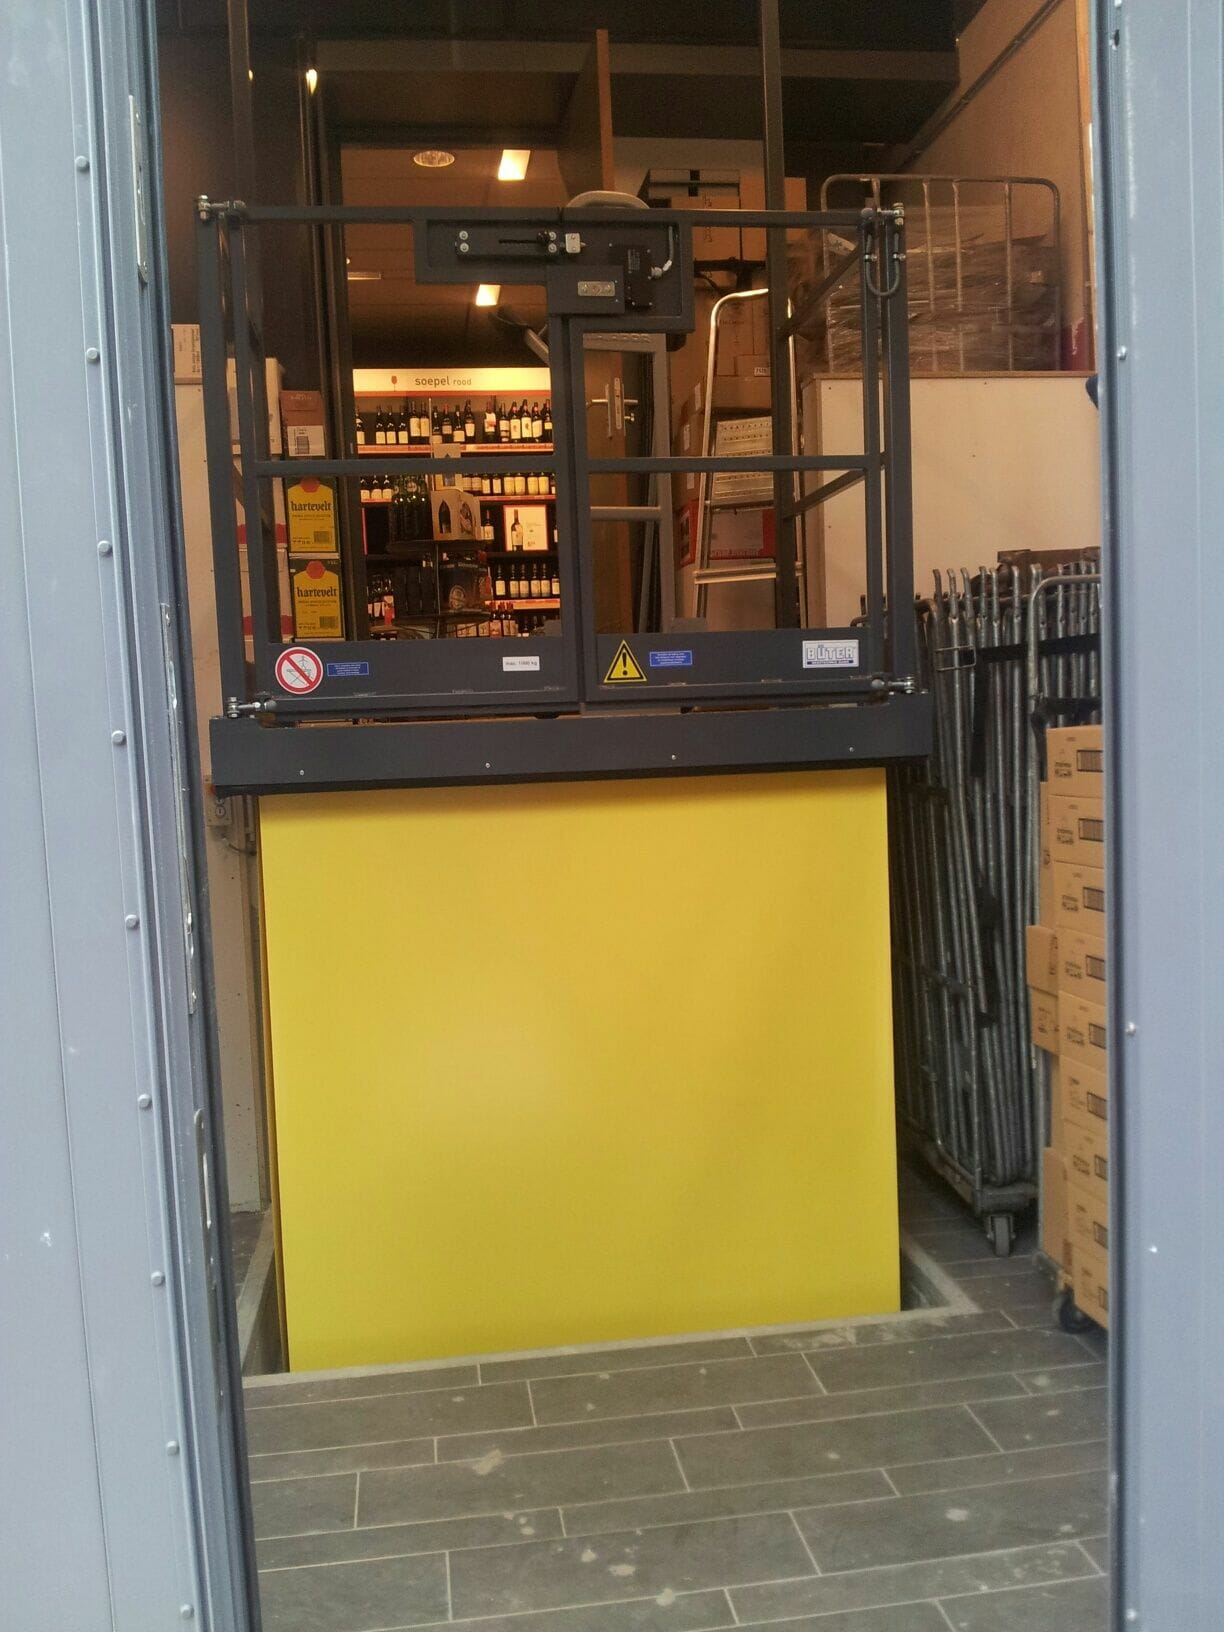 Figure Cargo lift in yellow